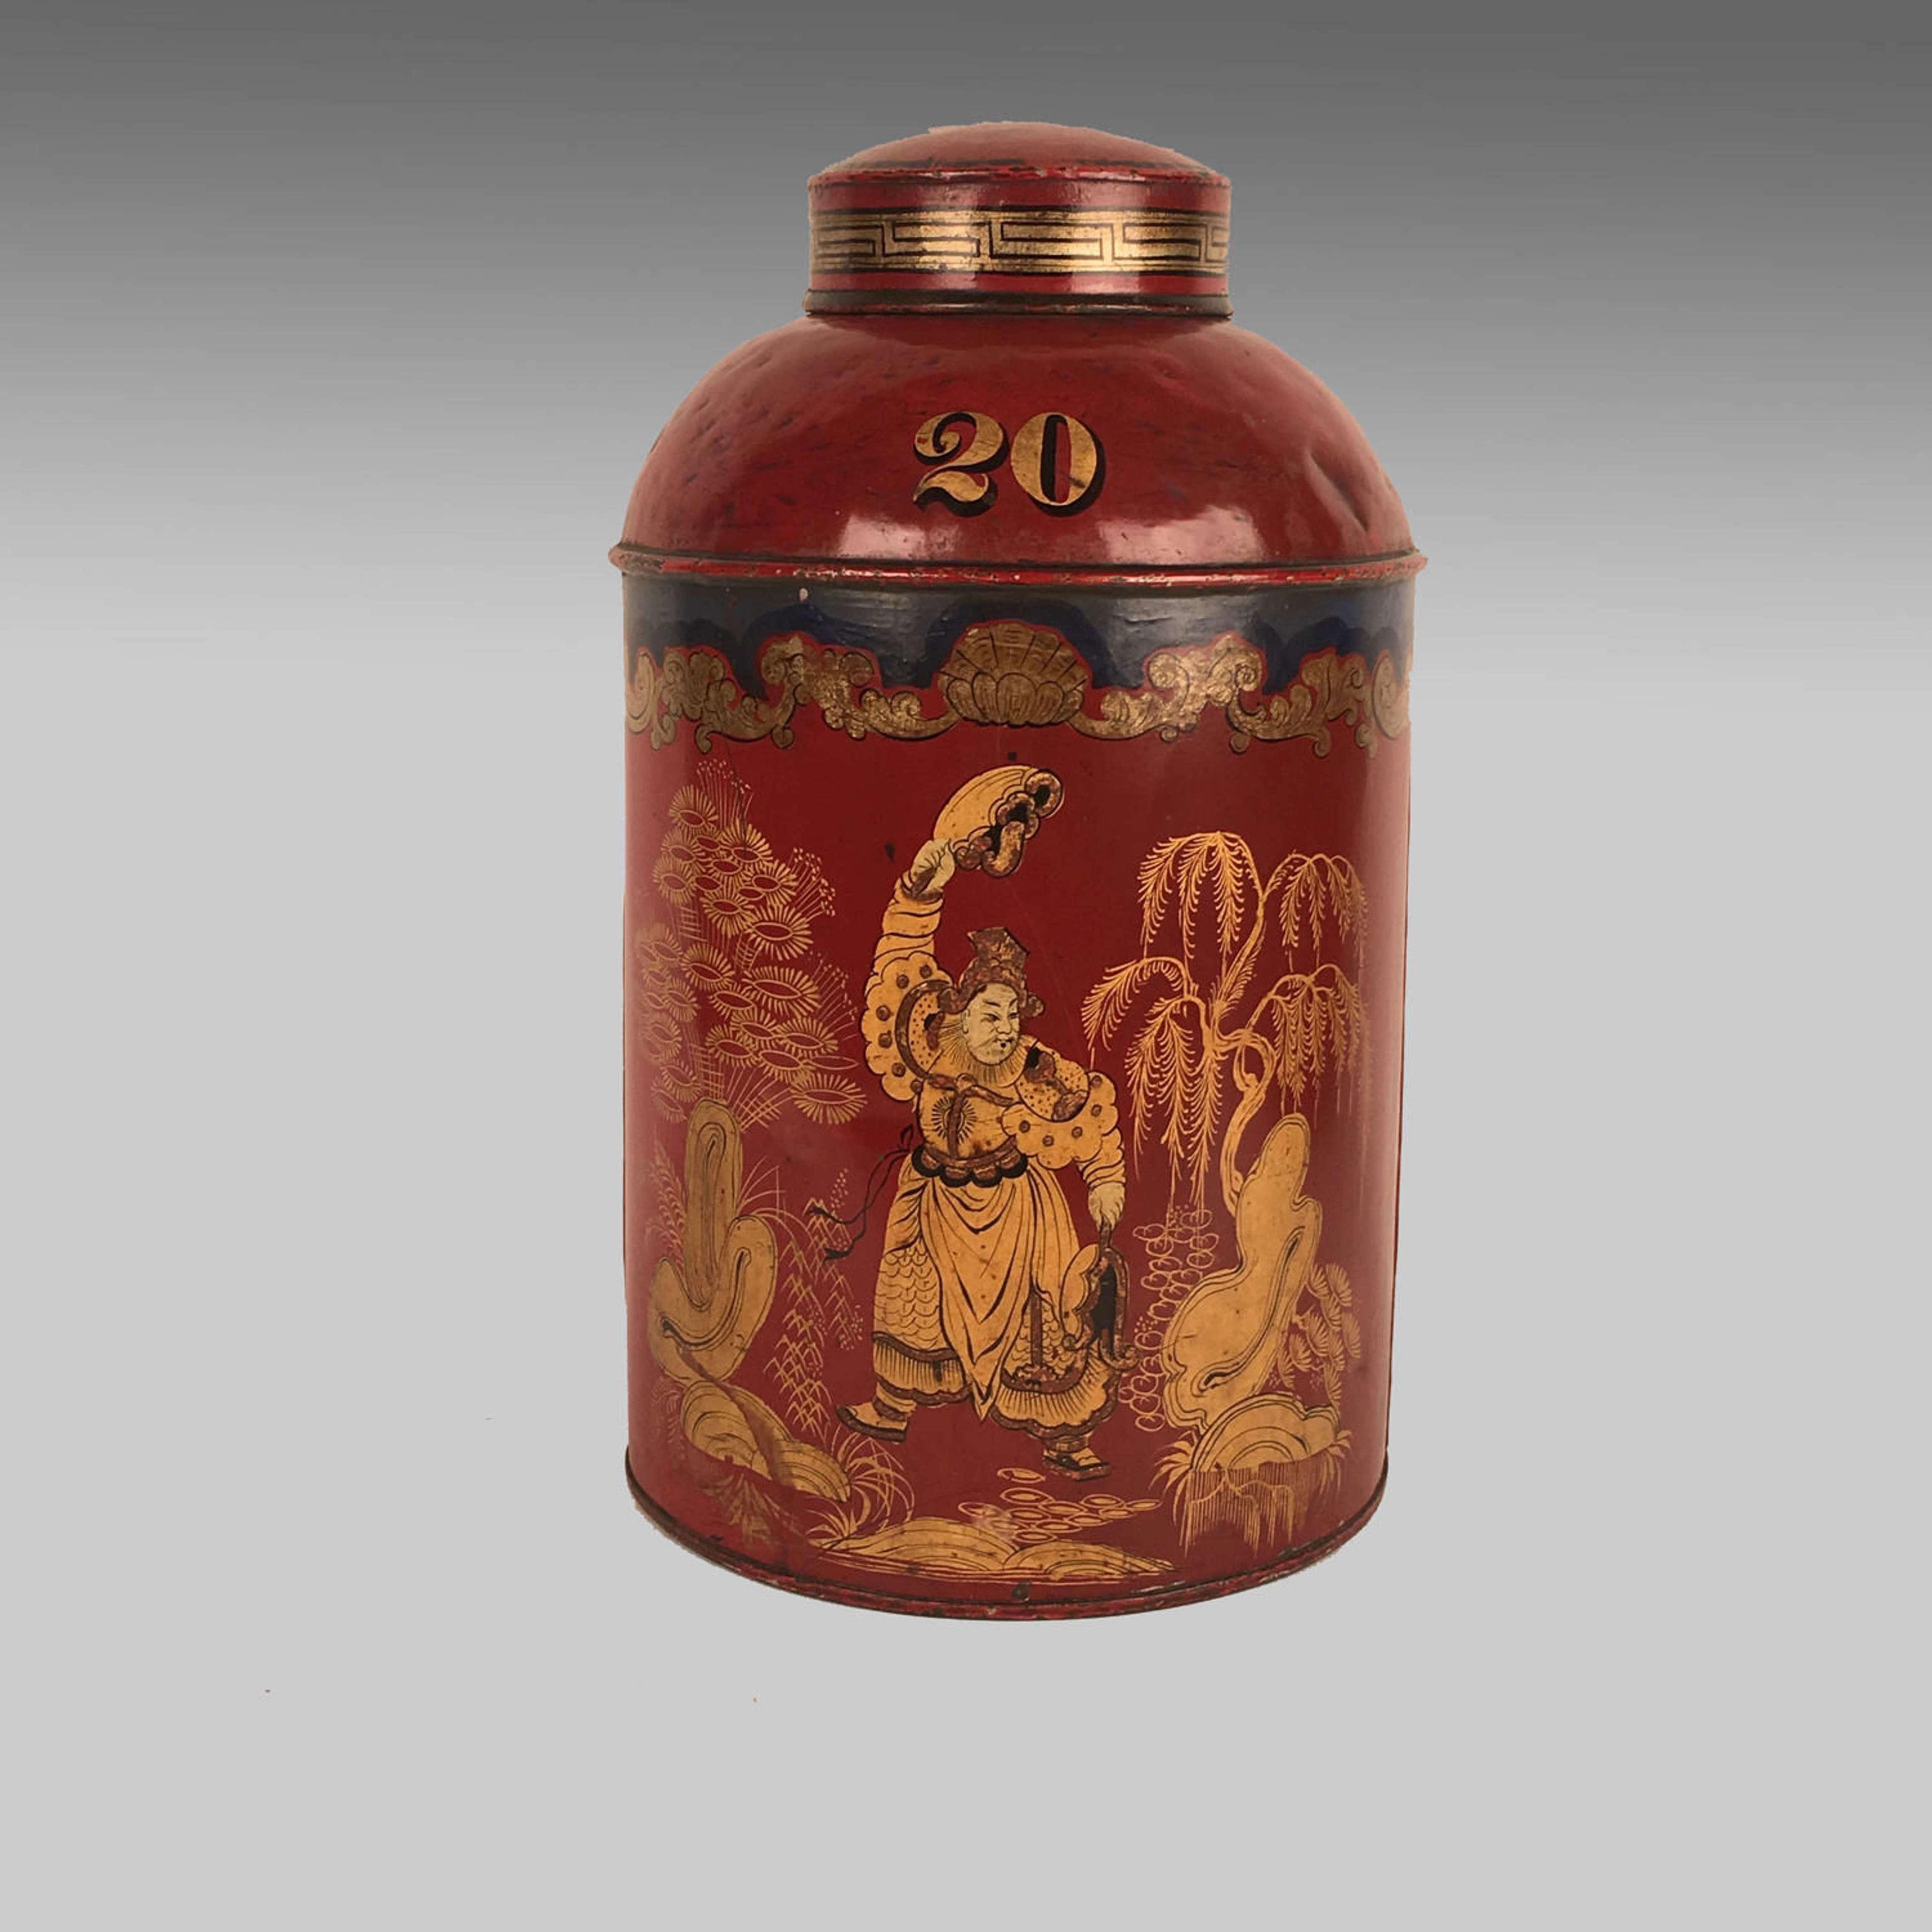 Antique 19th century tea canister